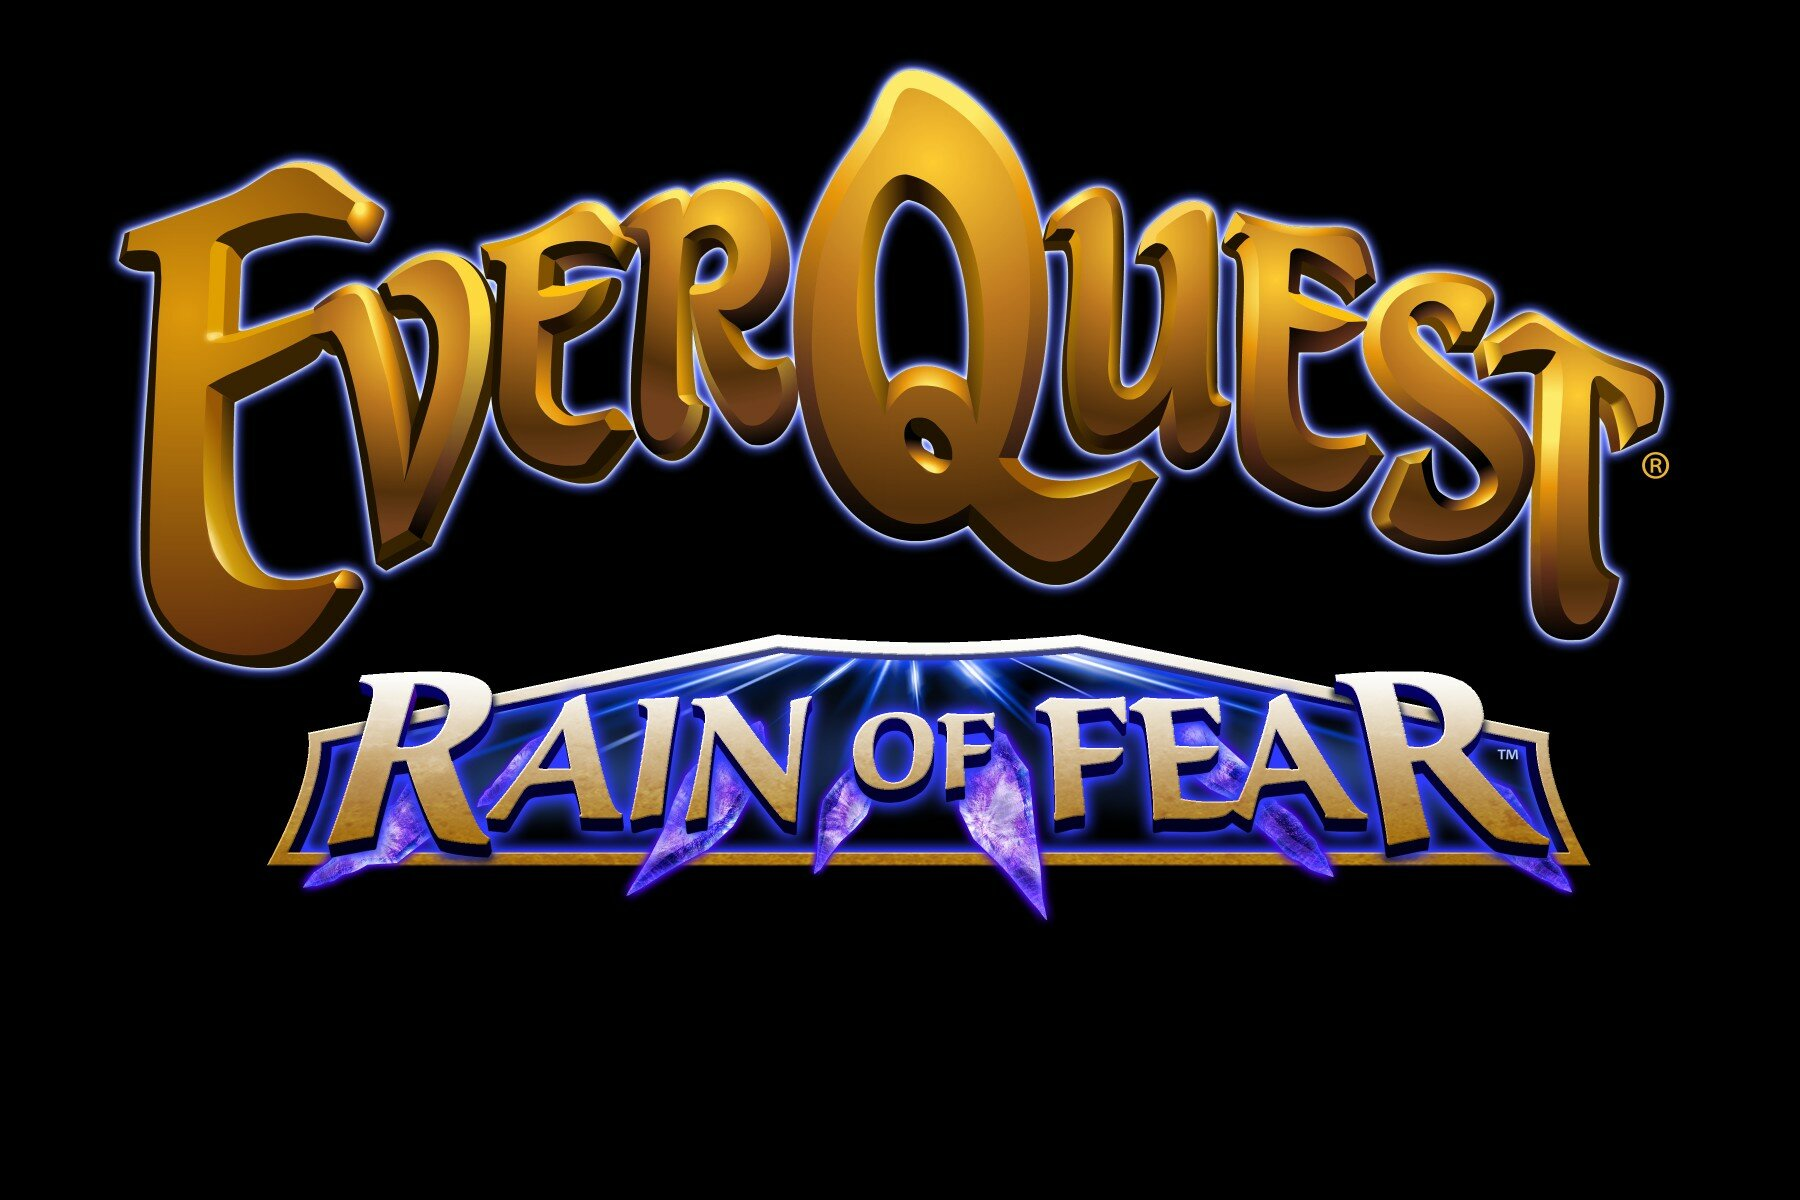 EverQuest_RoF_Logo.jpg